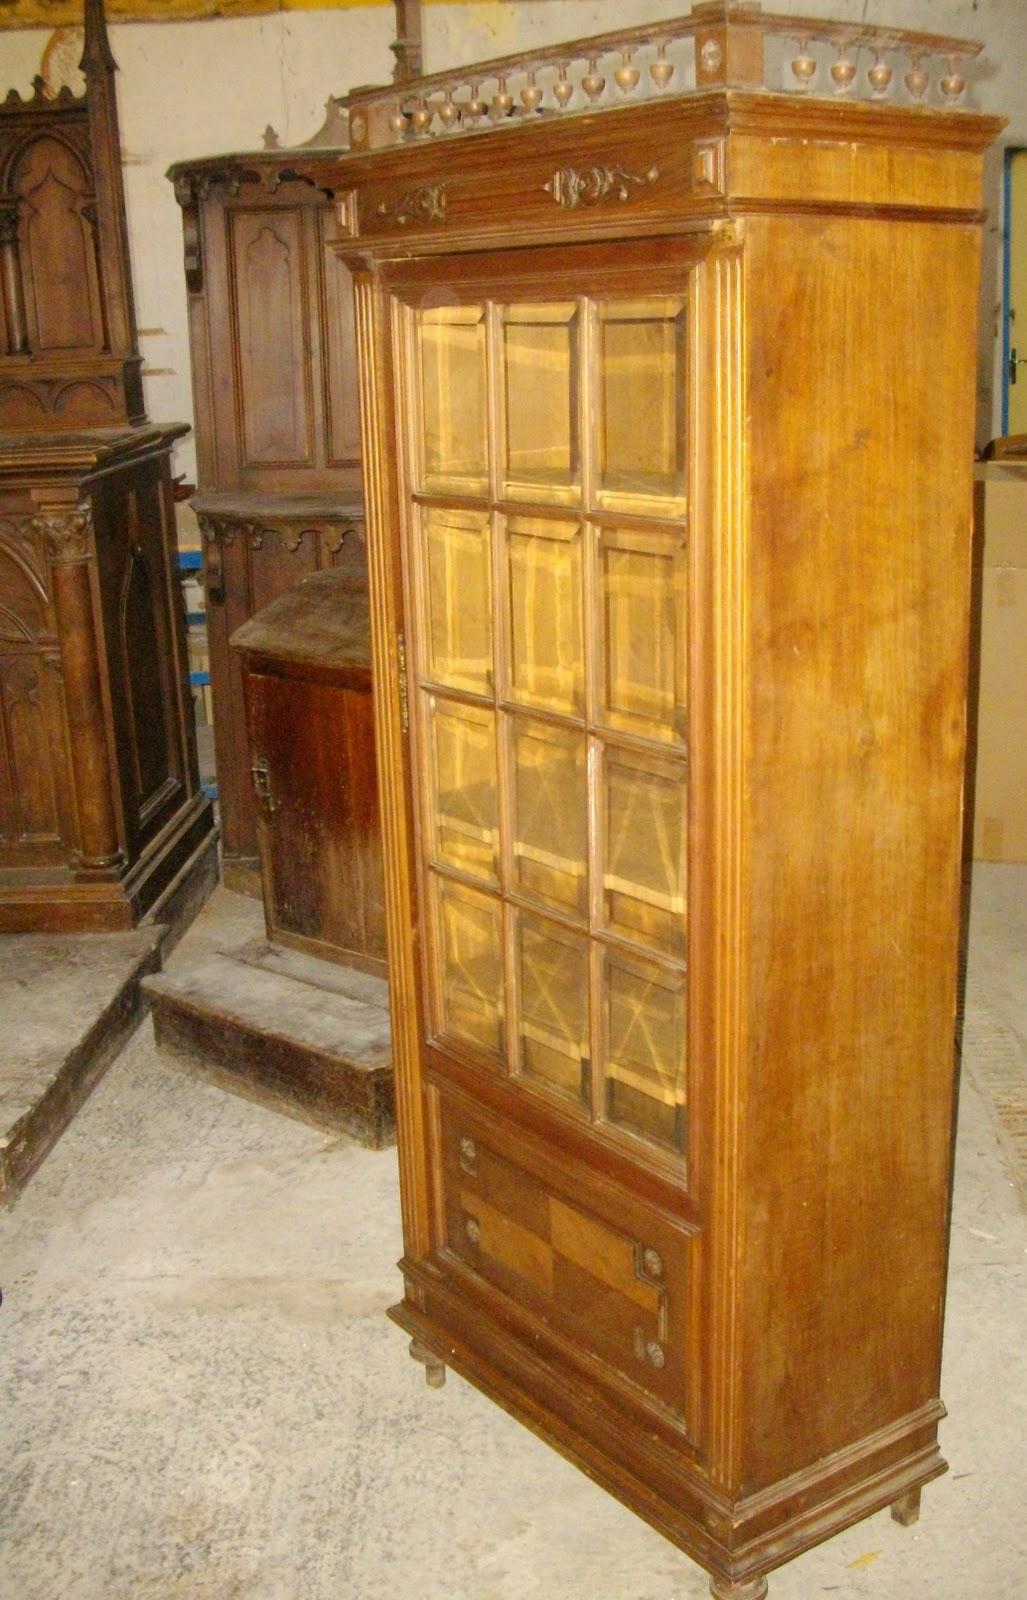 Ancienne Vitrine Bibliotheque Bois Vitres Verres Biseaut Es